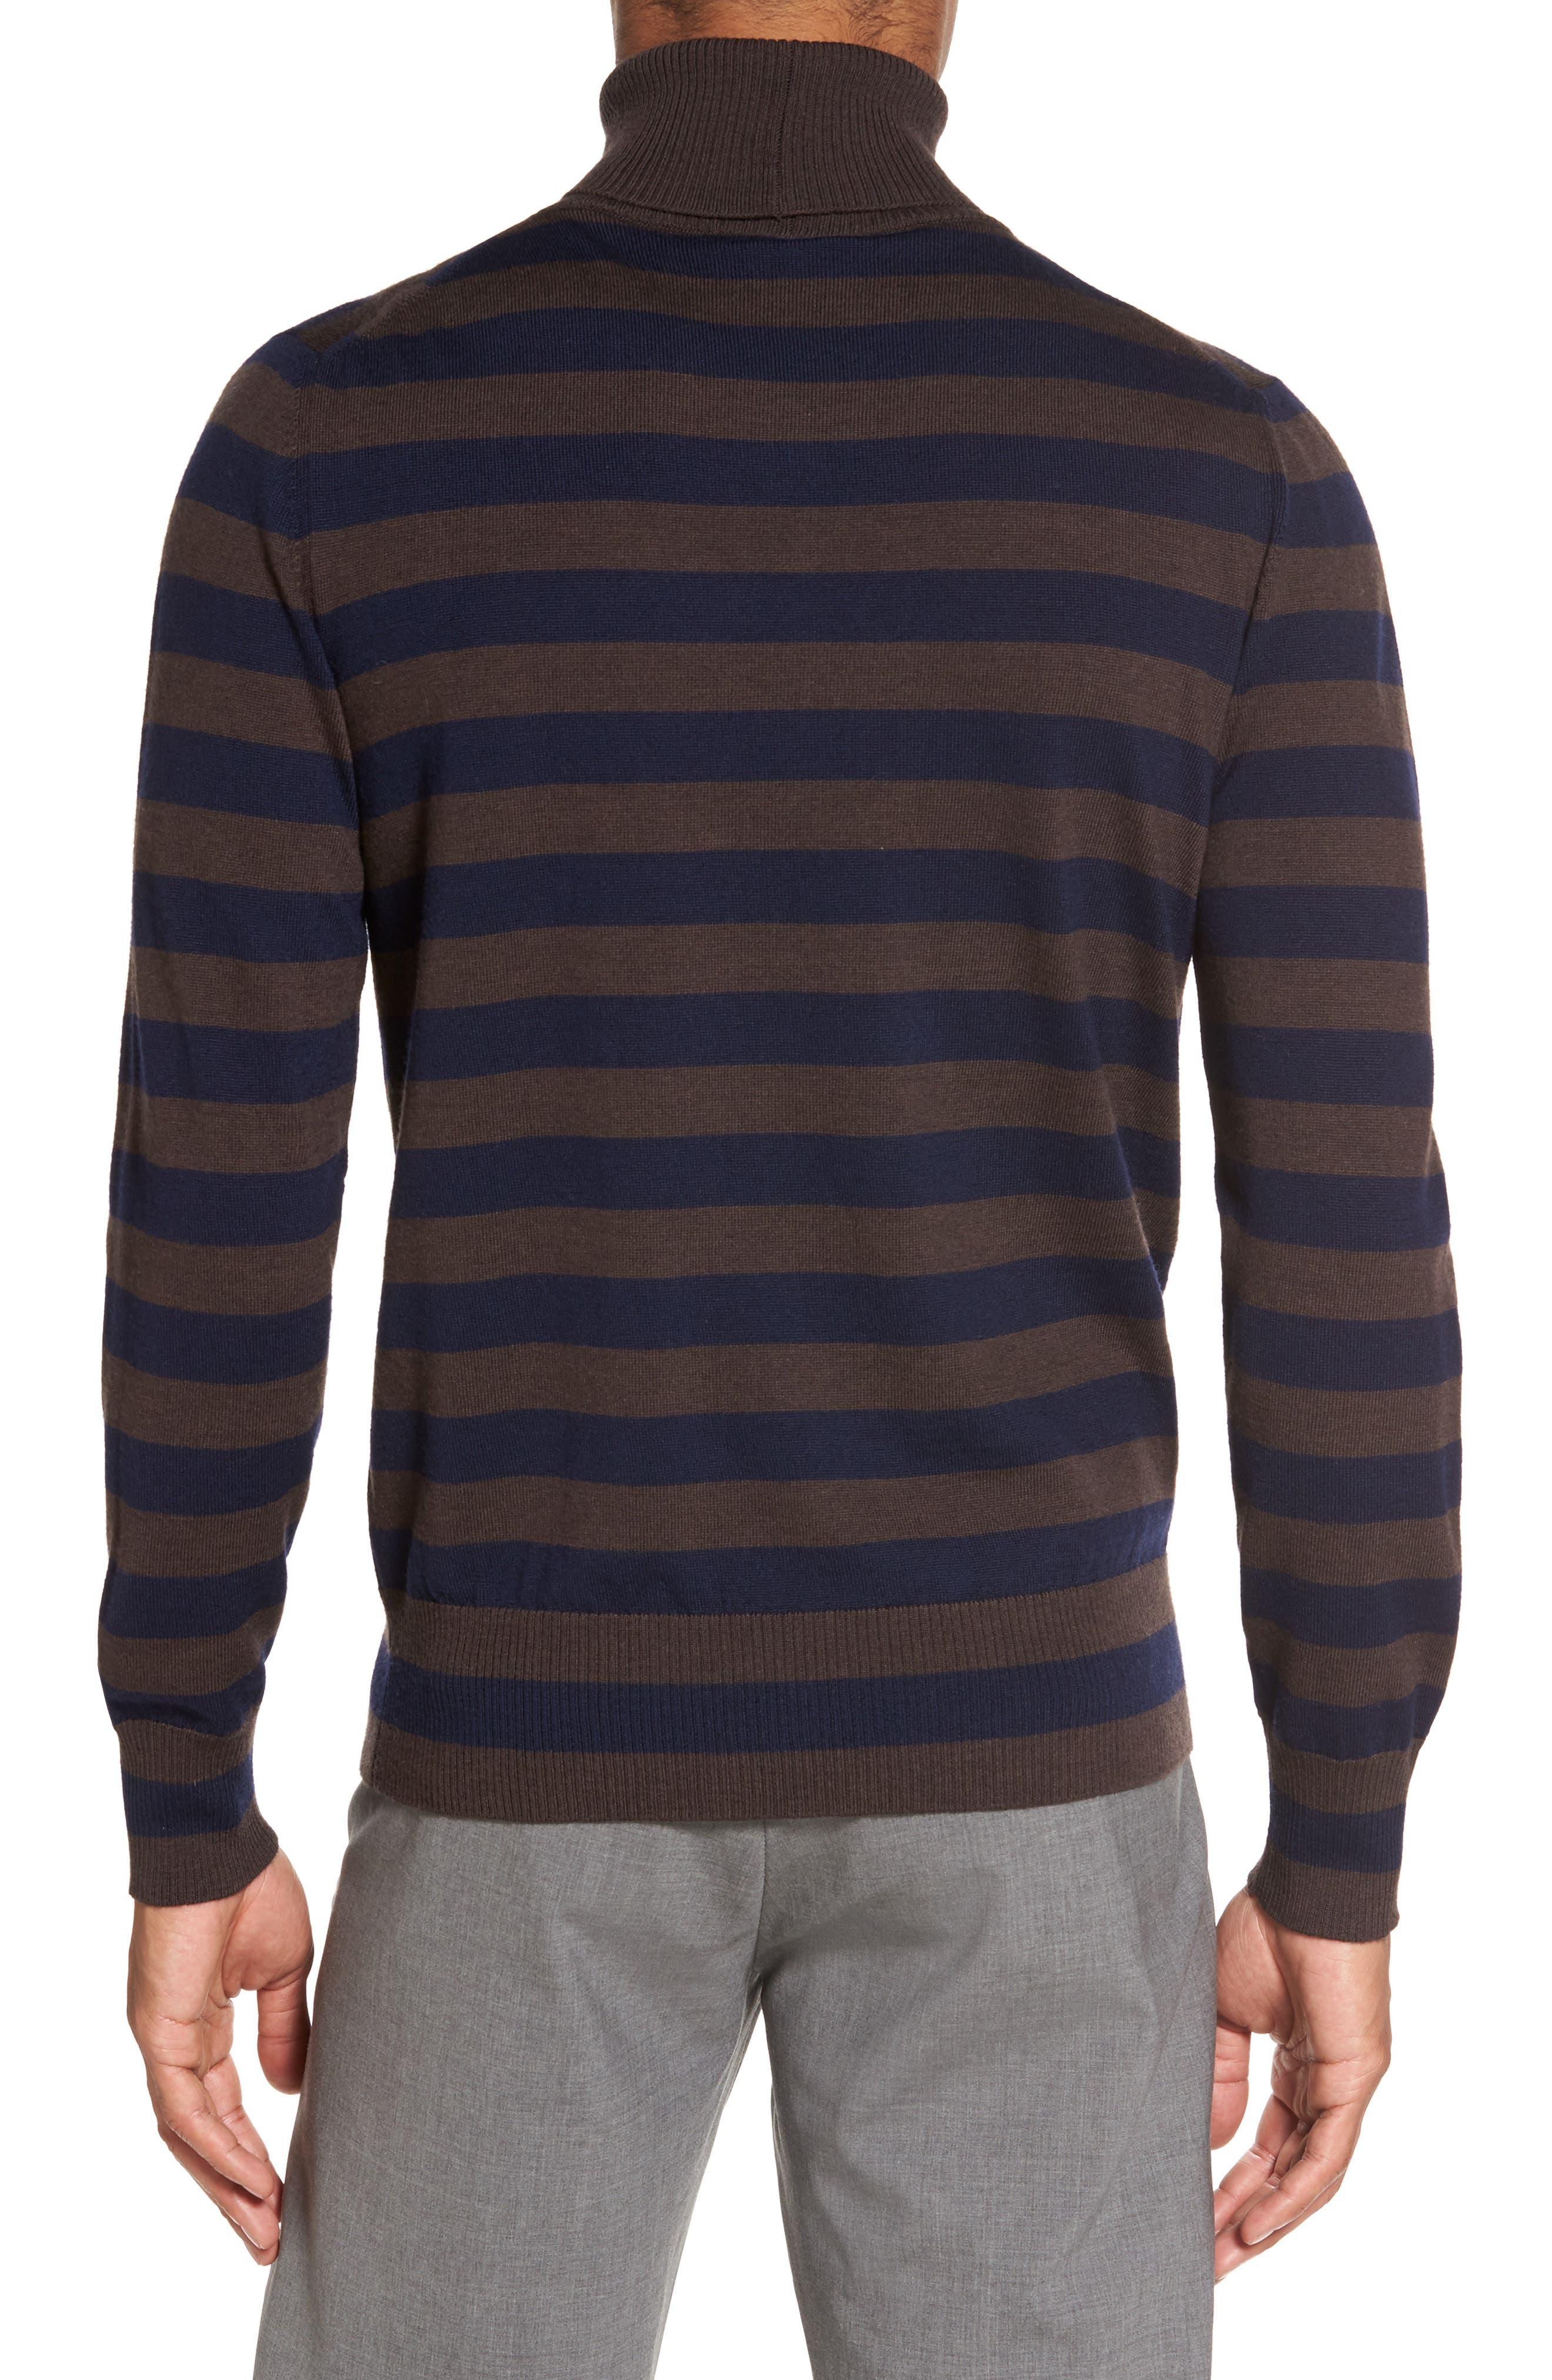 Striped Turtleneck Sweater,                             Alternate thumbnail 2, color,                             204